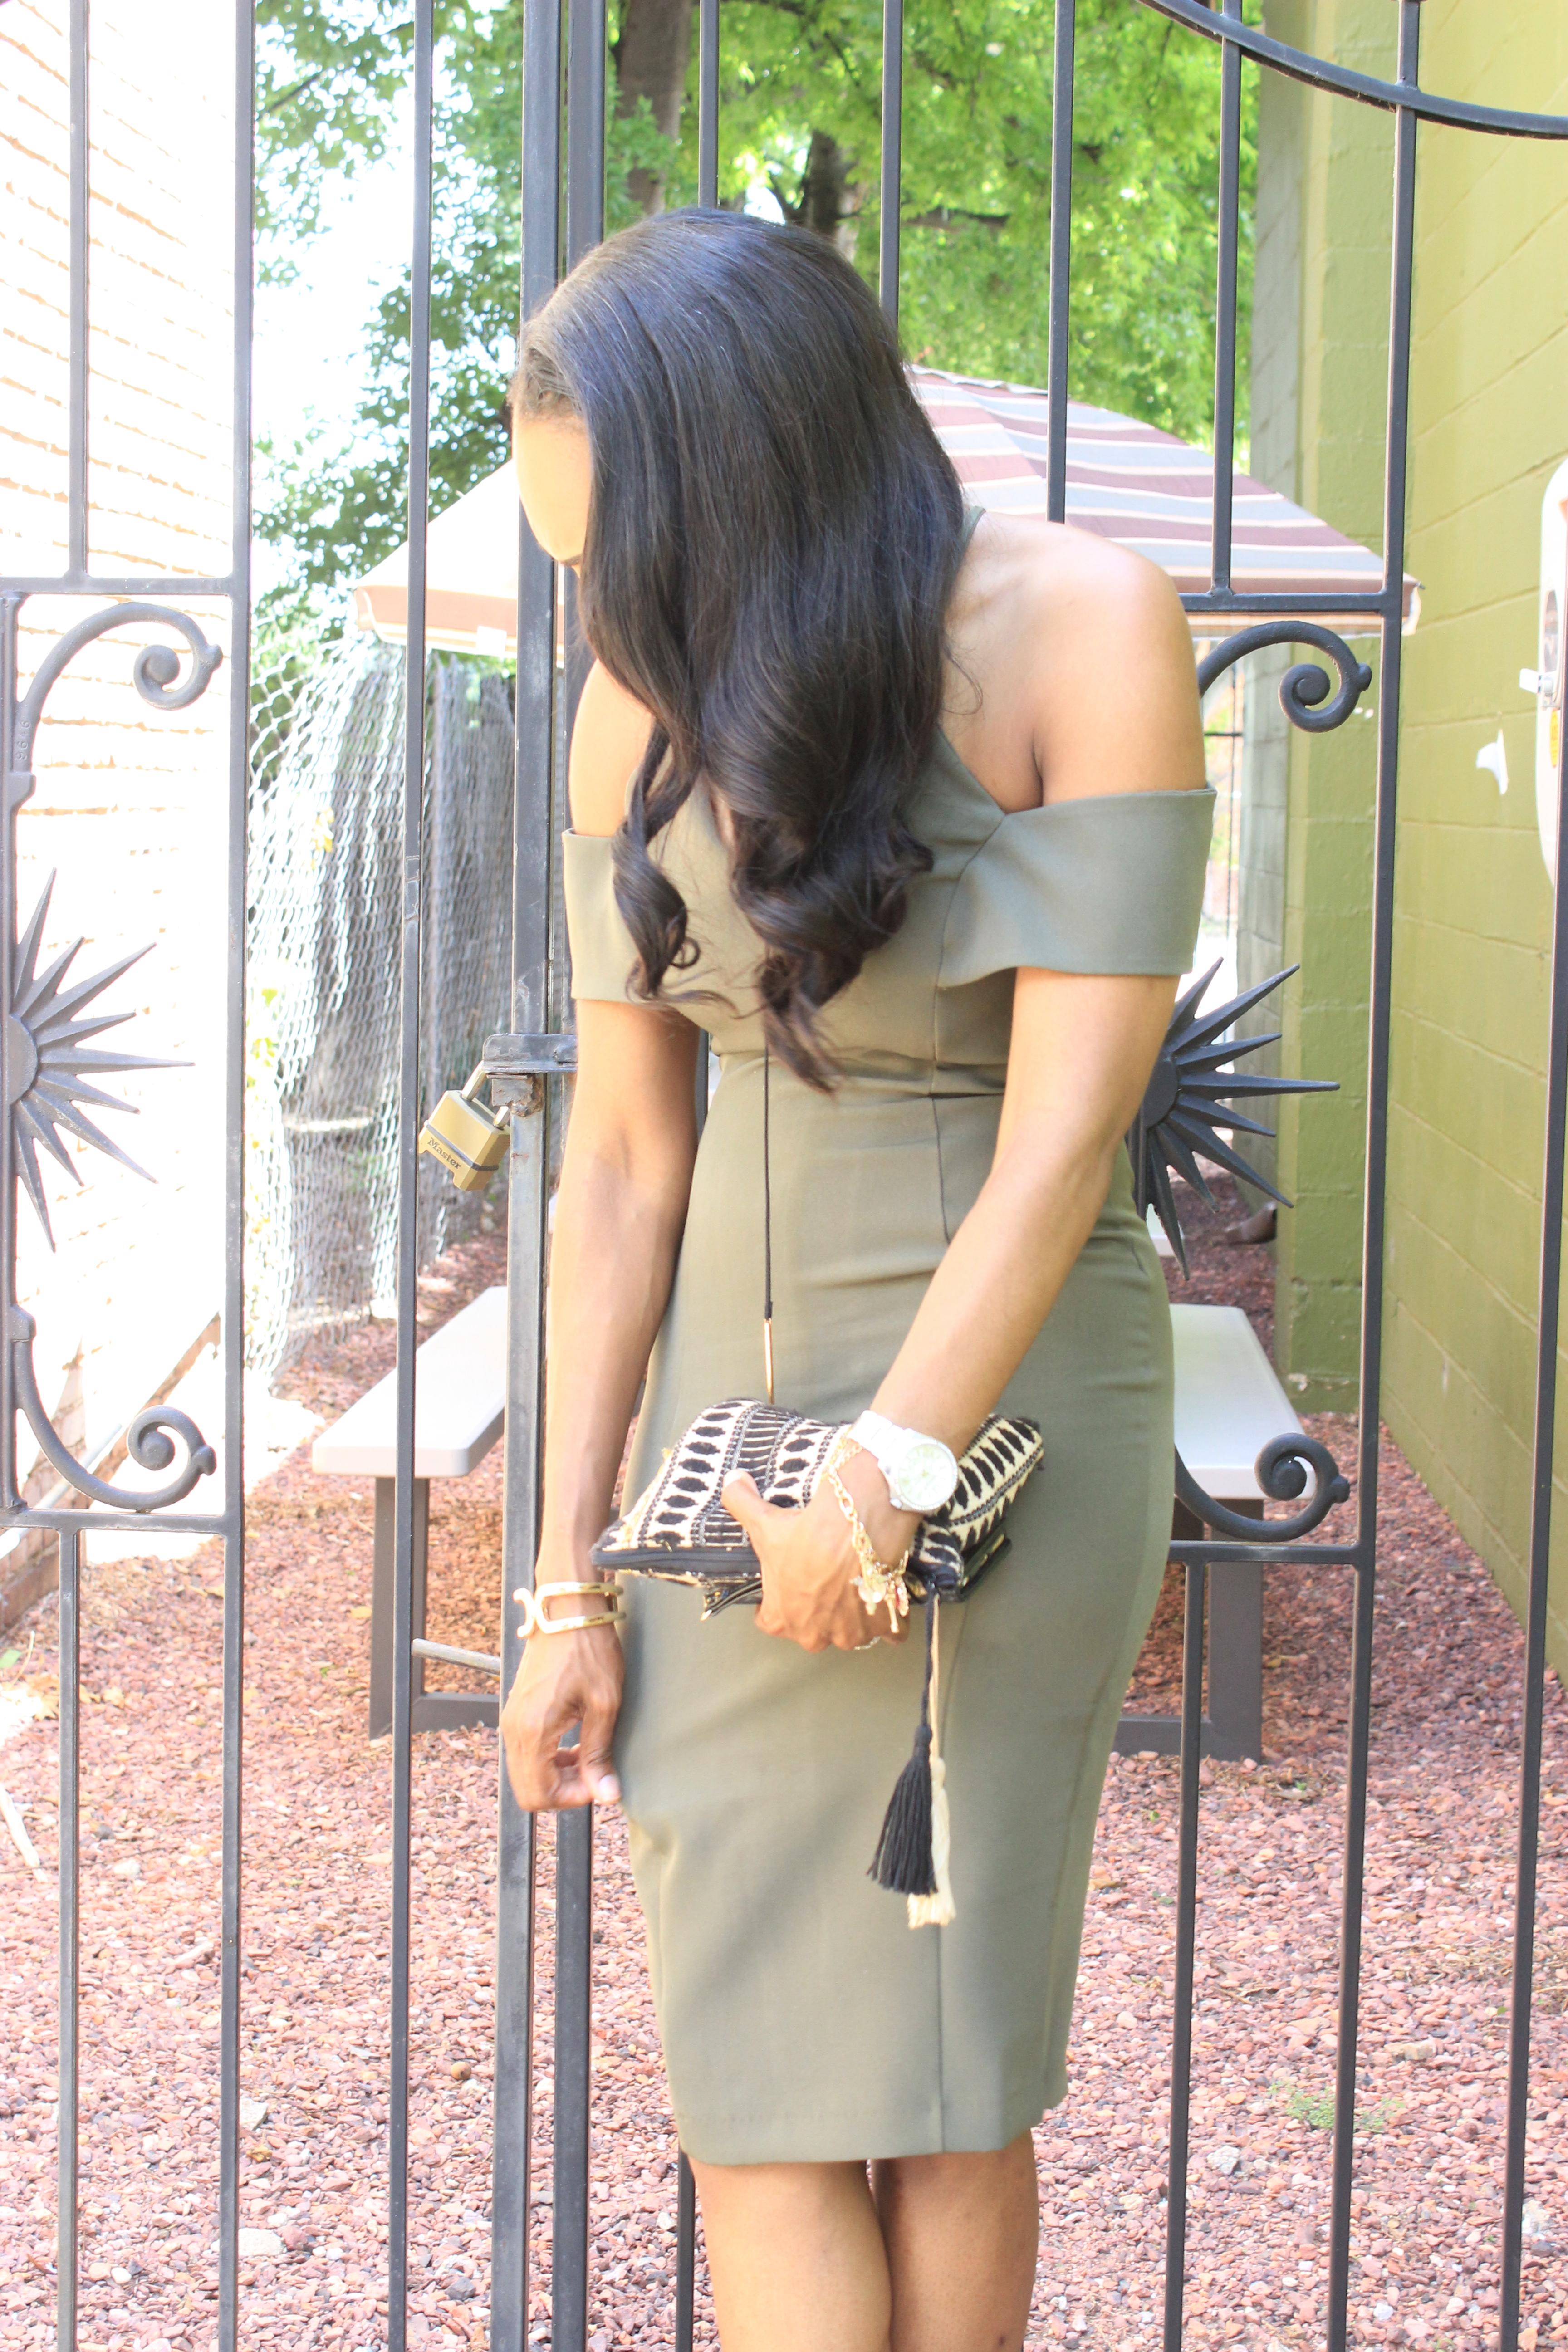 Style-Files-khaki-Vesper Cold-Shoulder-Pencil-Midi-Dress-JustFab-Acacia-Heeled-Sandals-Olive-Green-how to-wear-olive-green-how-to-wear-khaki-oohlalablog-9